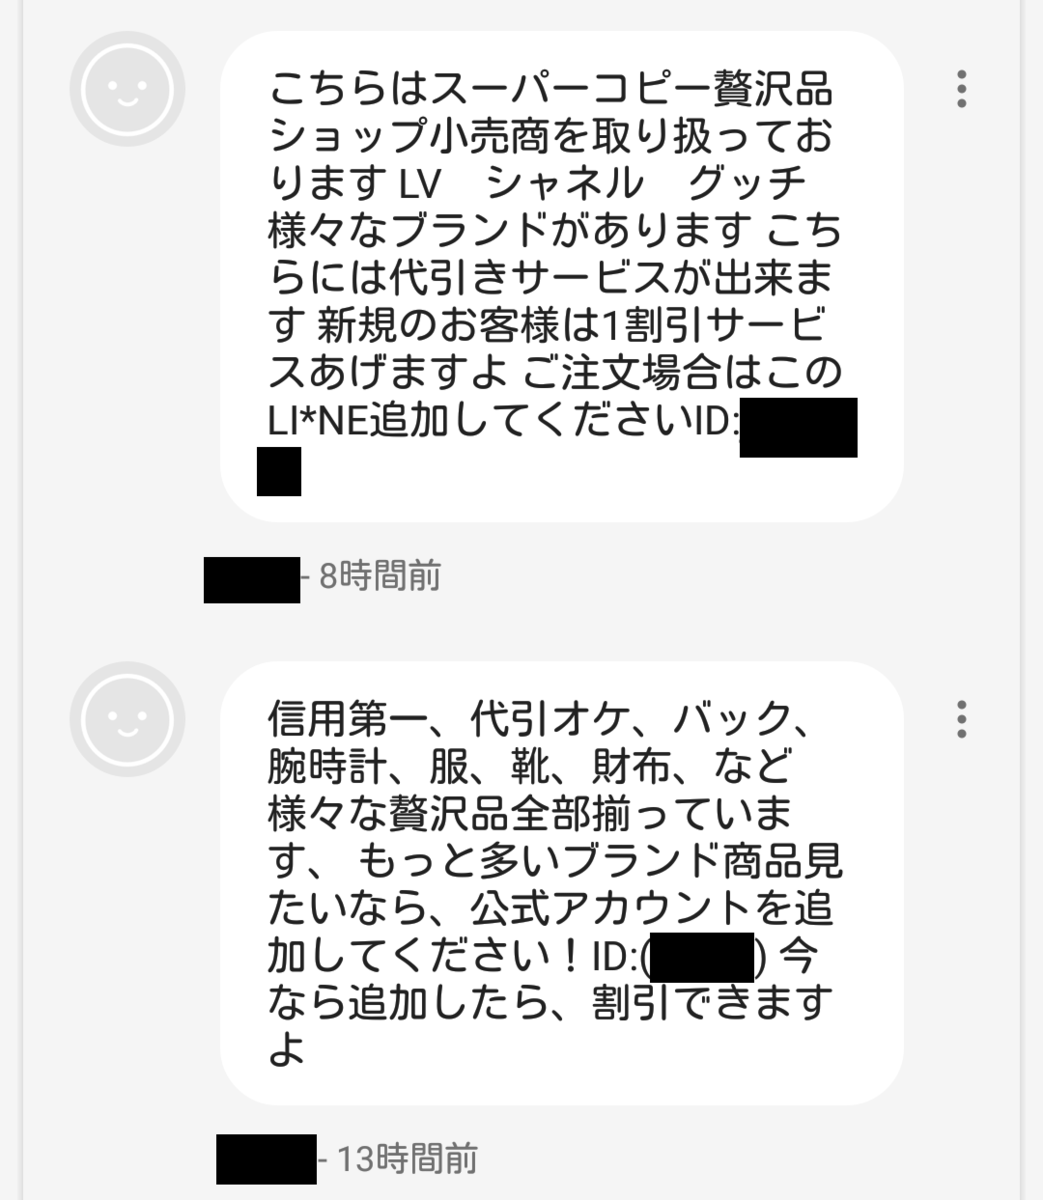 f:id:yotsumao:20190409132216p:plain